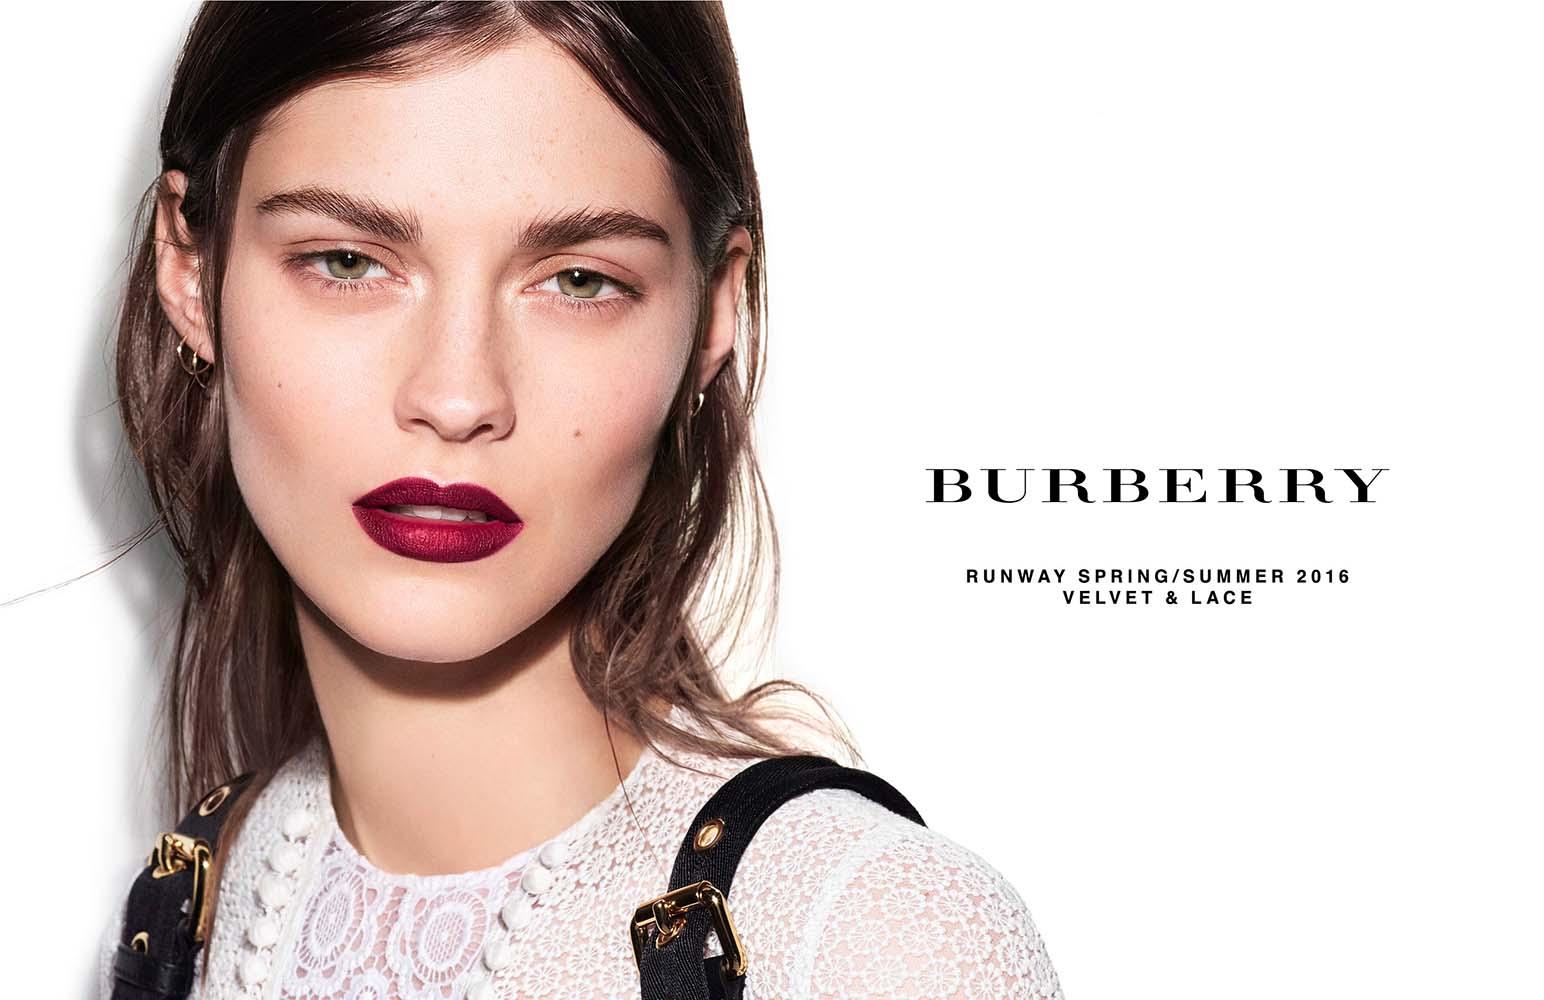 Burberry by Cuneyt Akeroglu